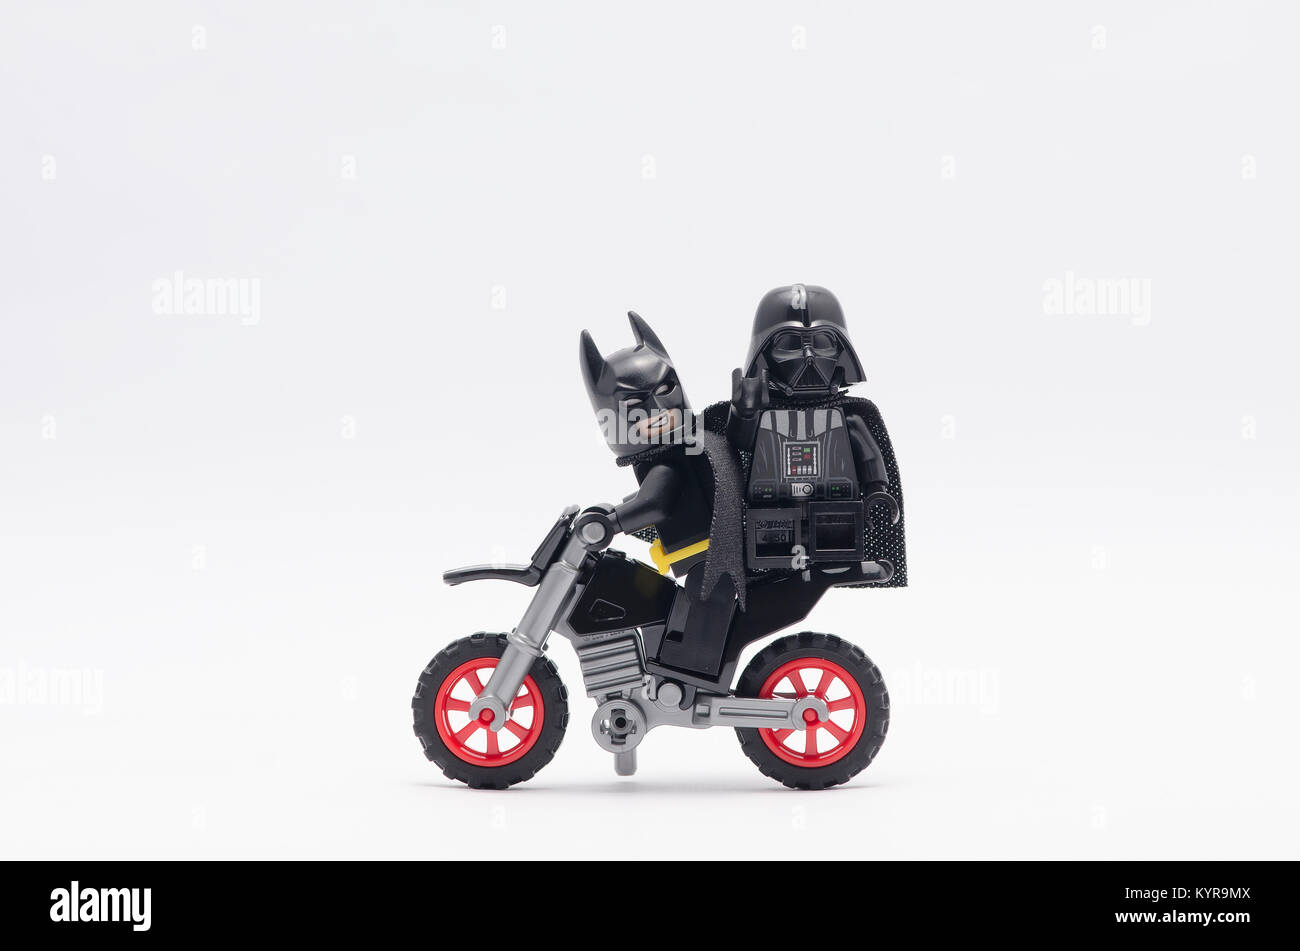 Lego Batman Riding Dirt Bike With Darth Vader